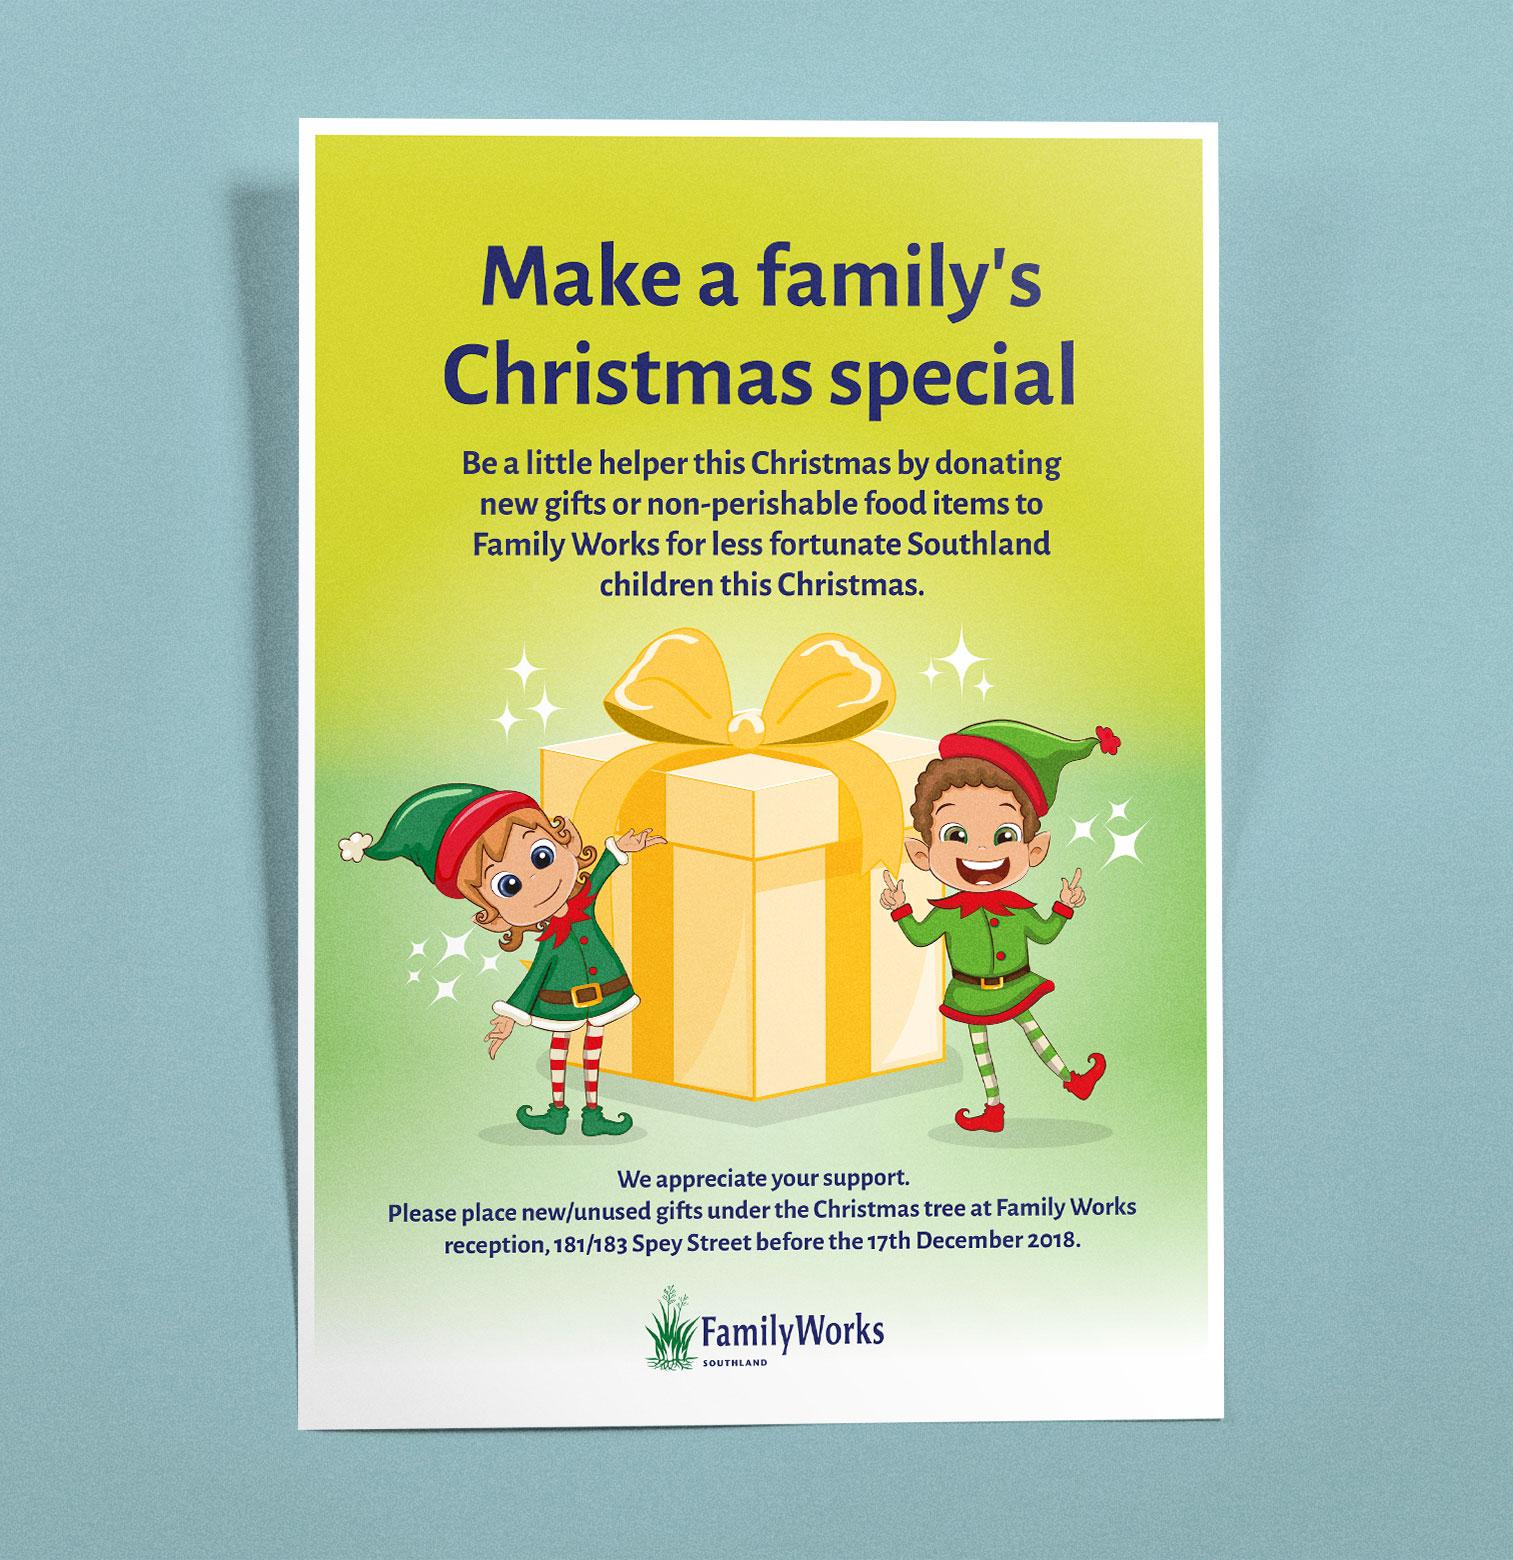 FW-Christmas-Poster.jpg